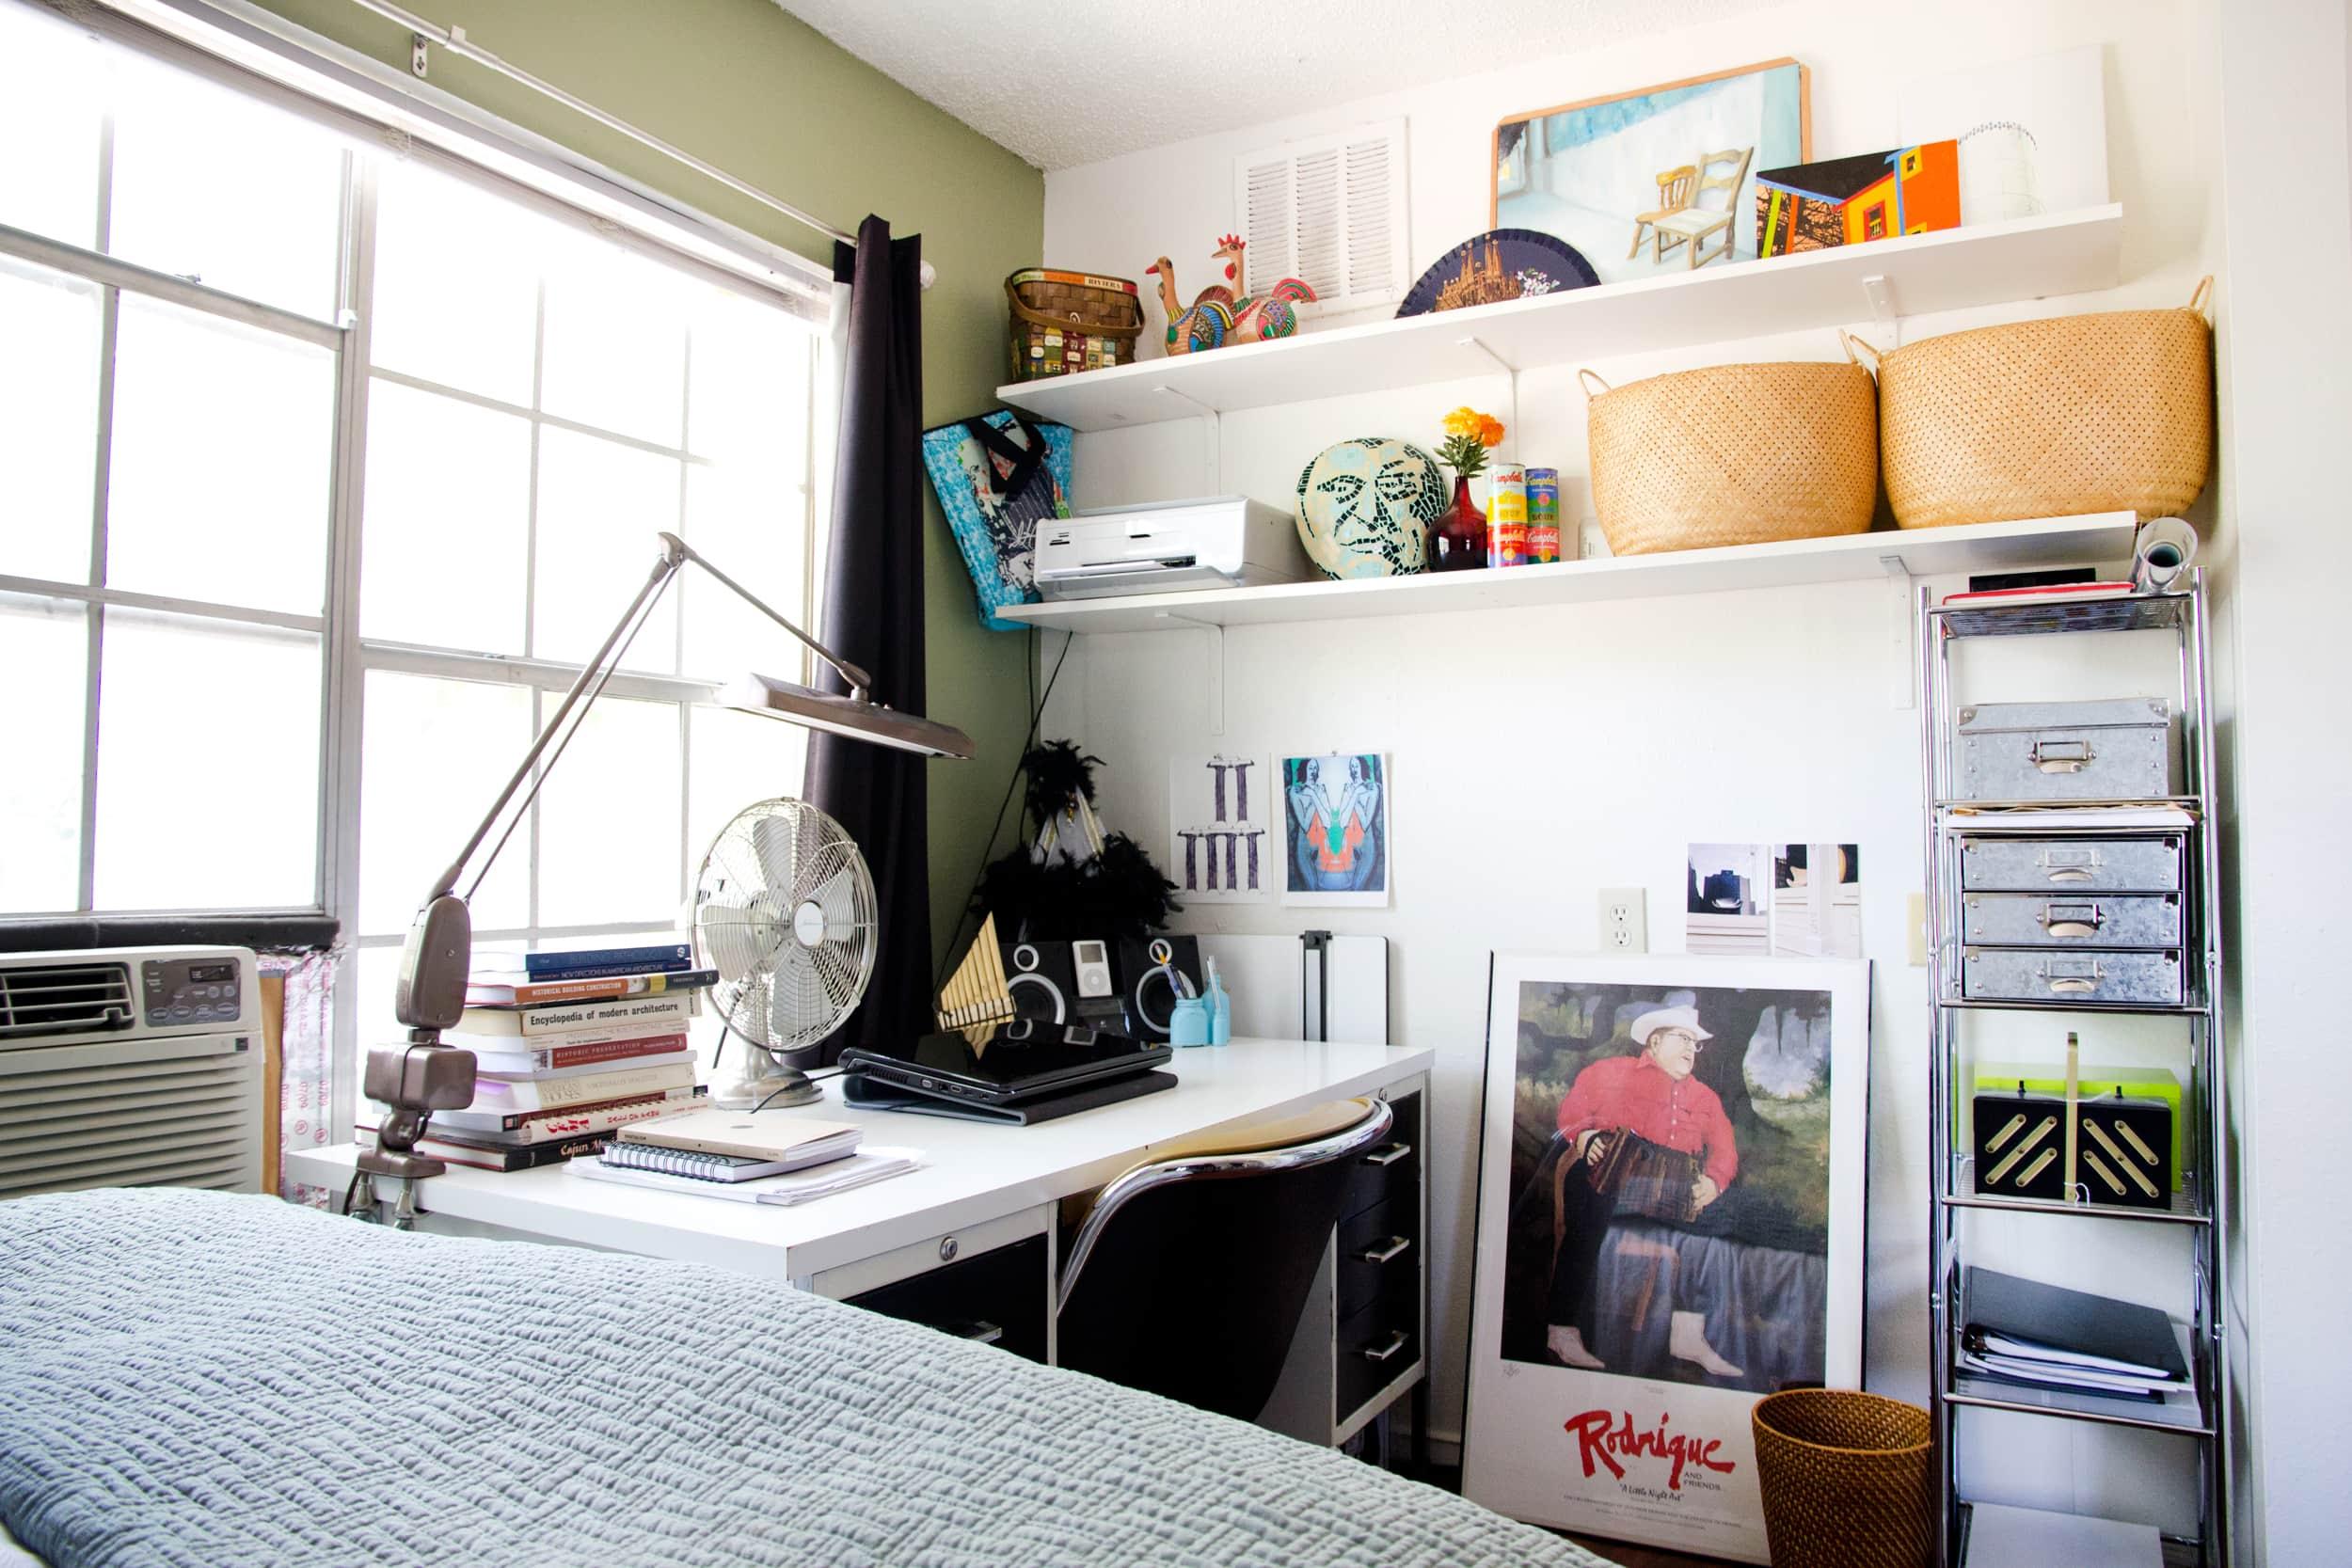 House tour a 400 square foot austin studio apartment - 400 sq ft studio apartment ideas ...